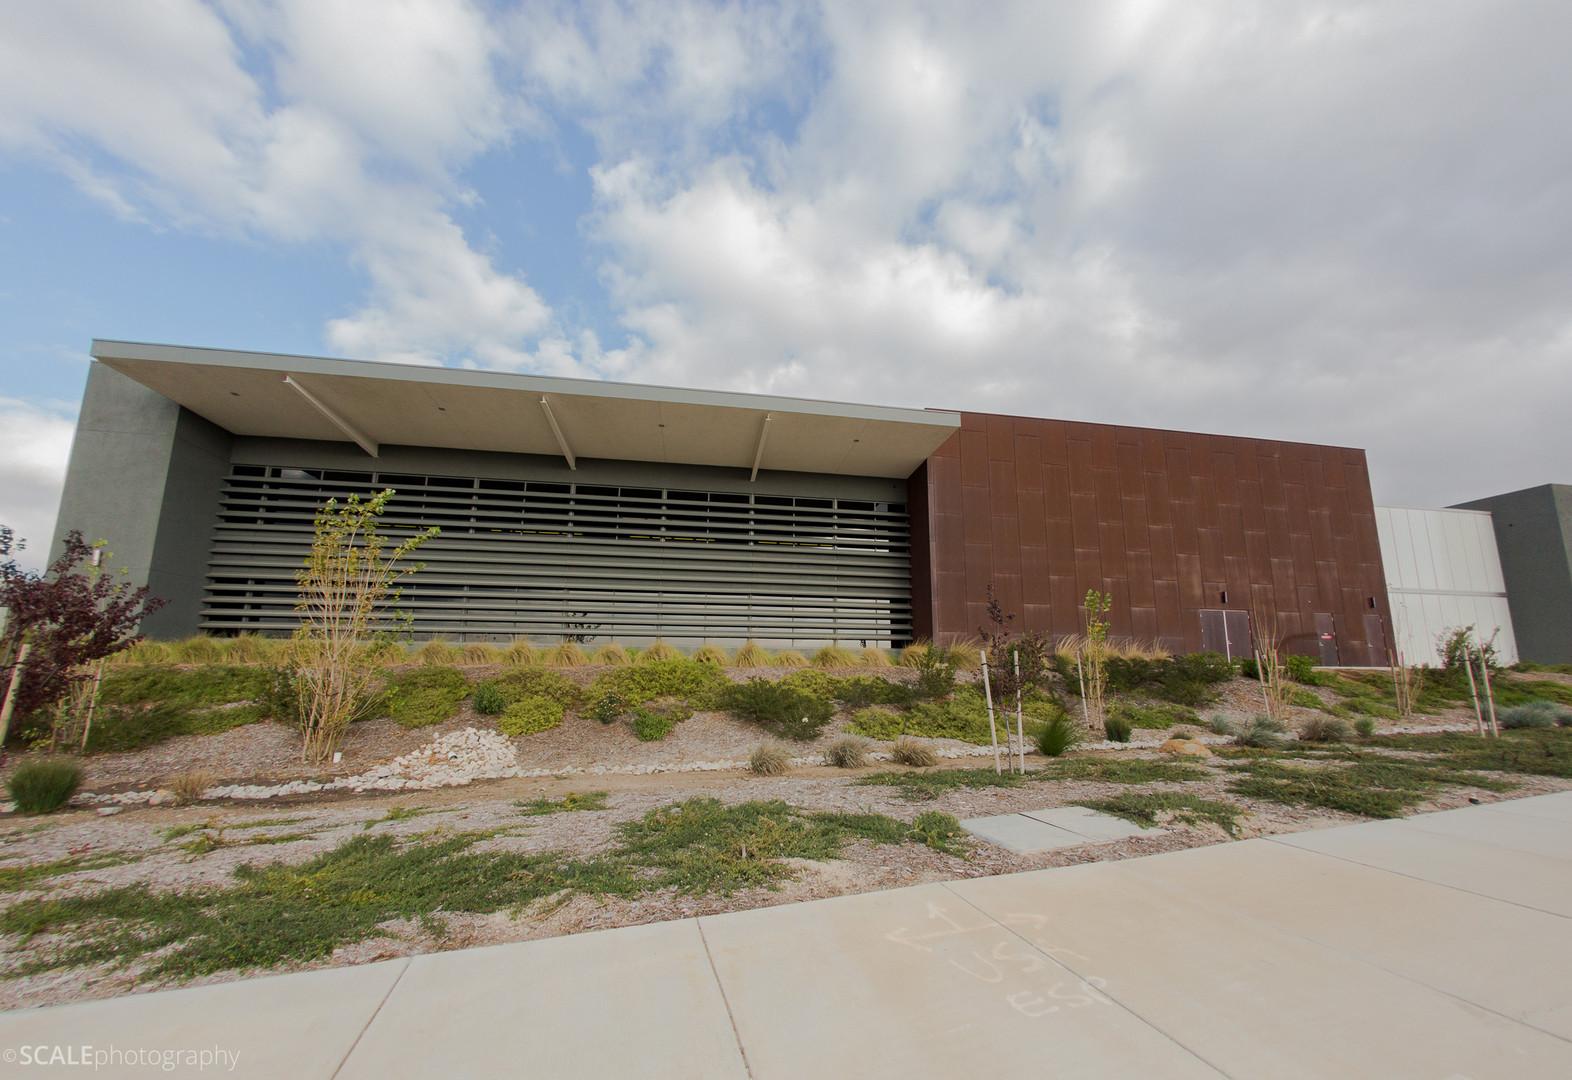 Rosetta HQ- San Luis Obispo, CA